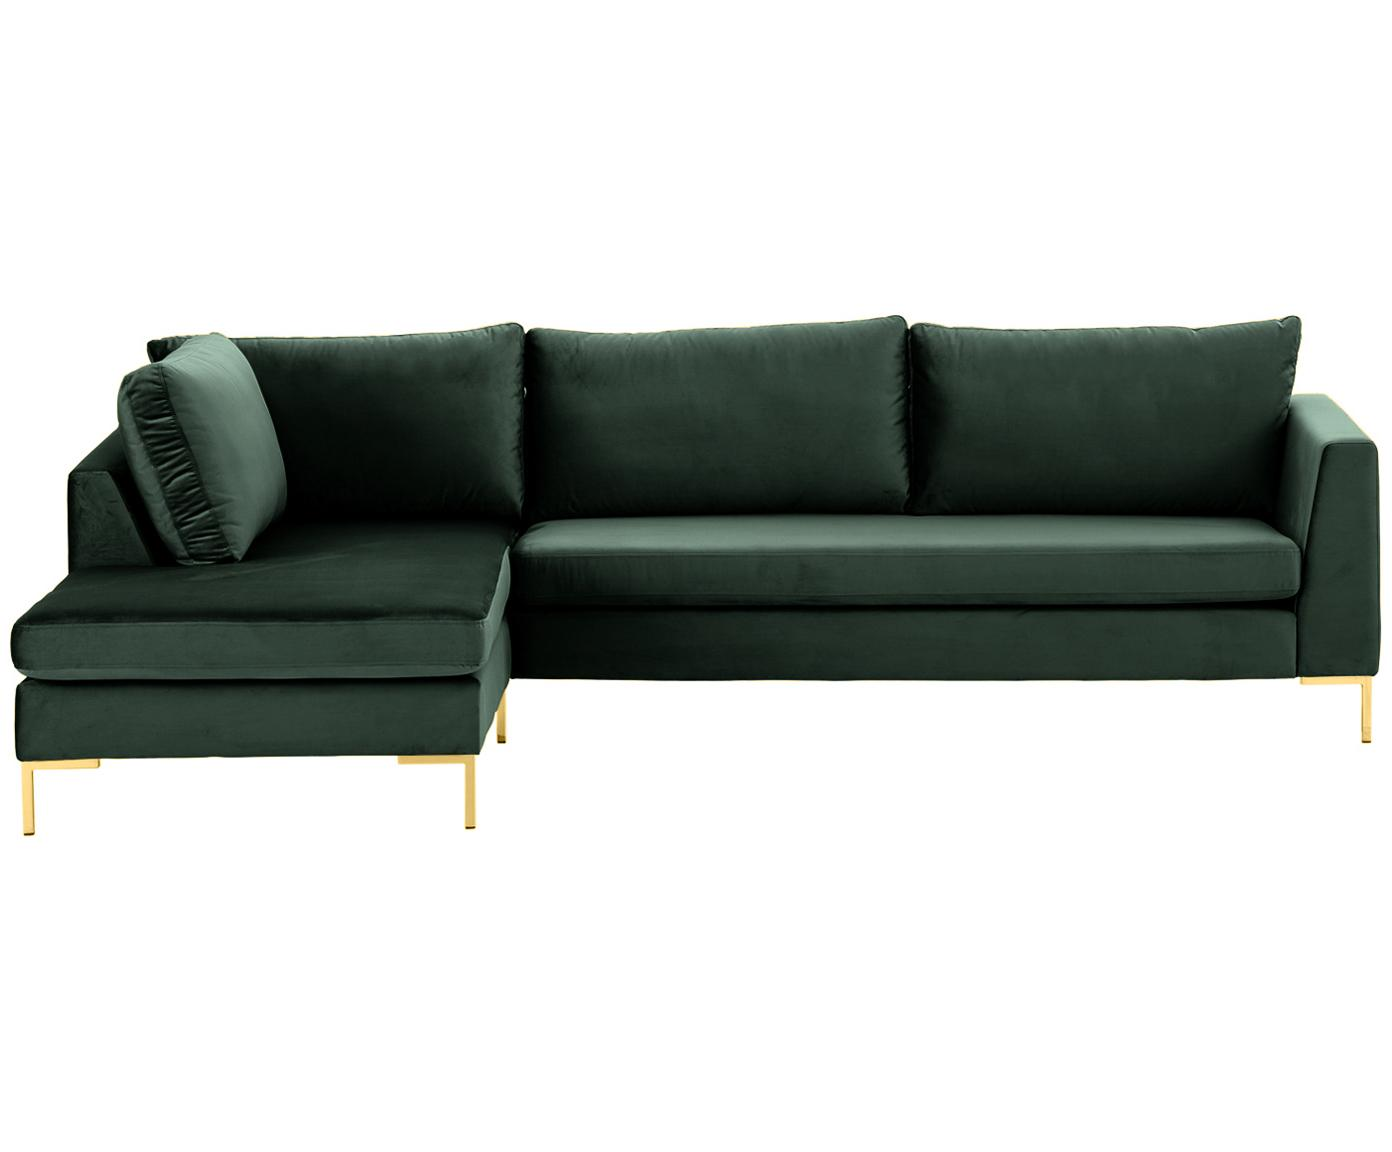 Samt-Ecksofa Luna, Bezug: Samt (Polyester) 80.000 S, Gestell: Massives Buchenholz, Füße: Metall, galvanisiert, Samt Dunkelgrün, Gold, B 280 x T 184 cm